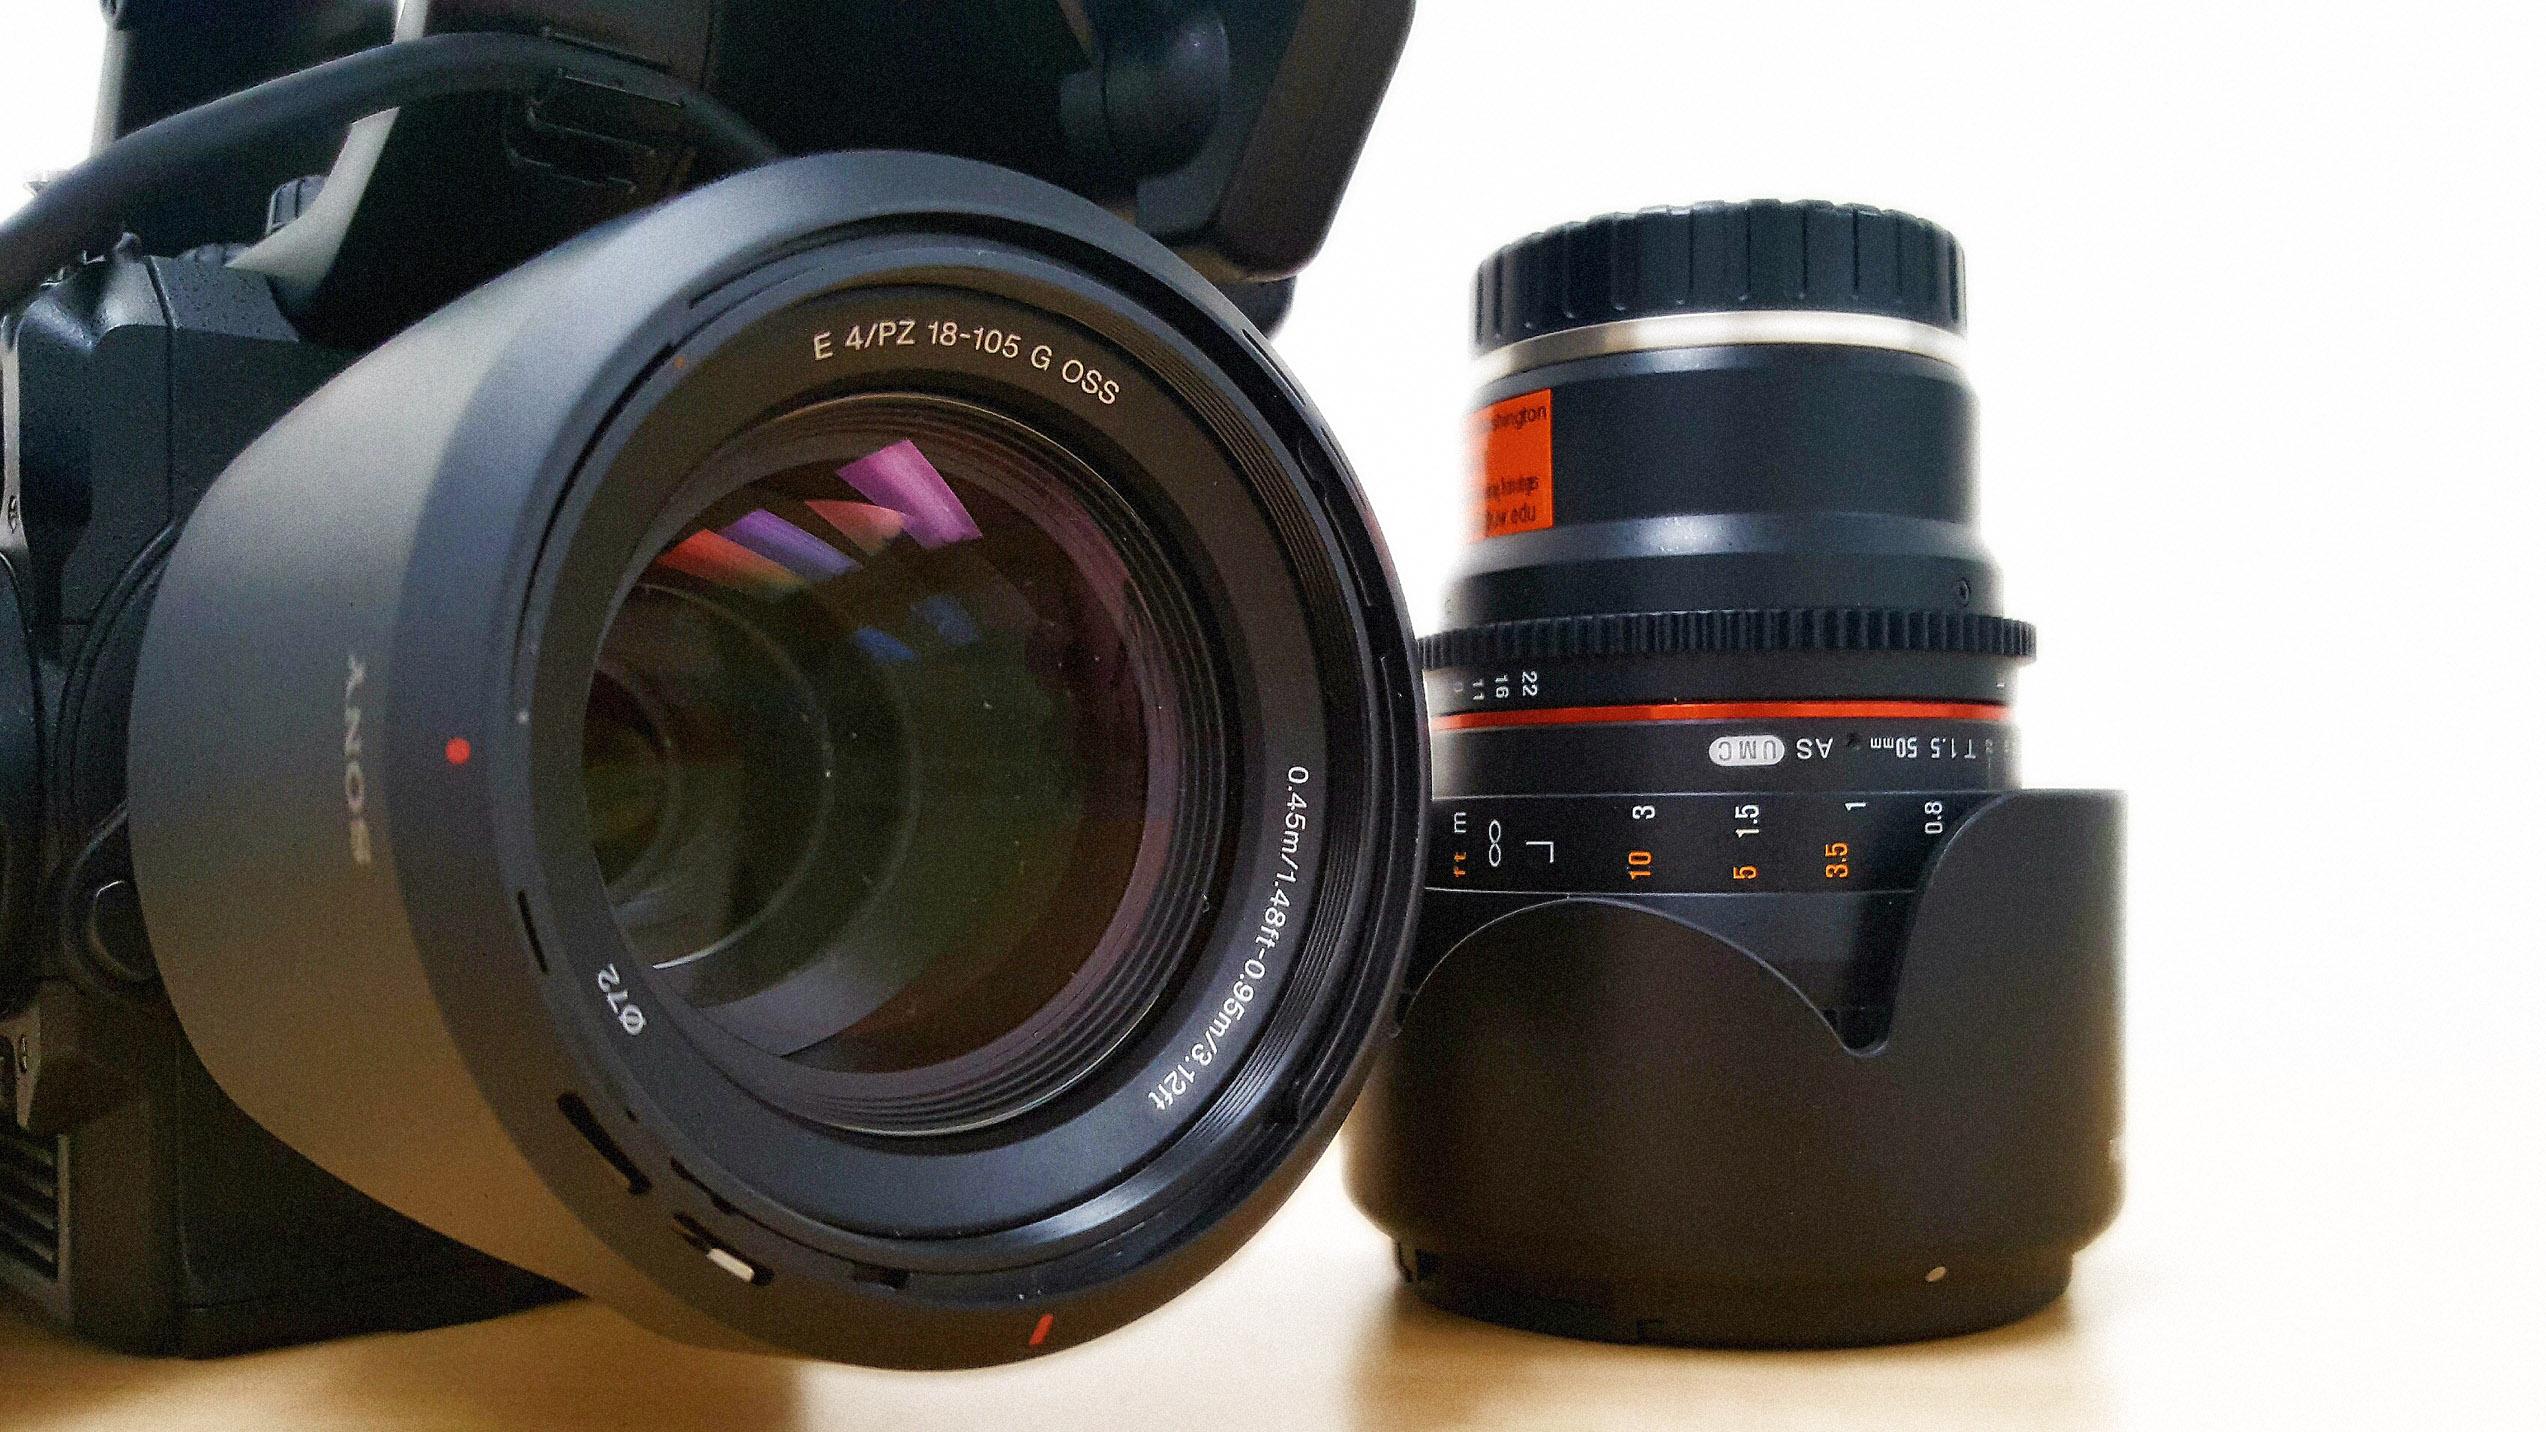 Photo of a camera